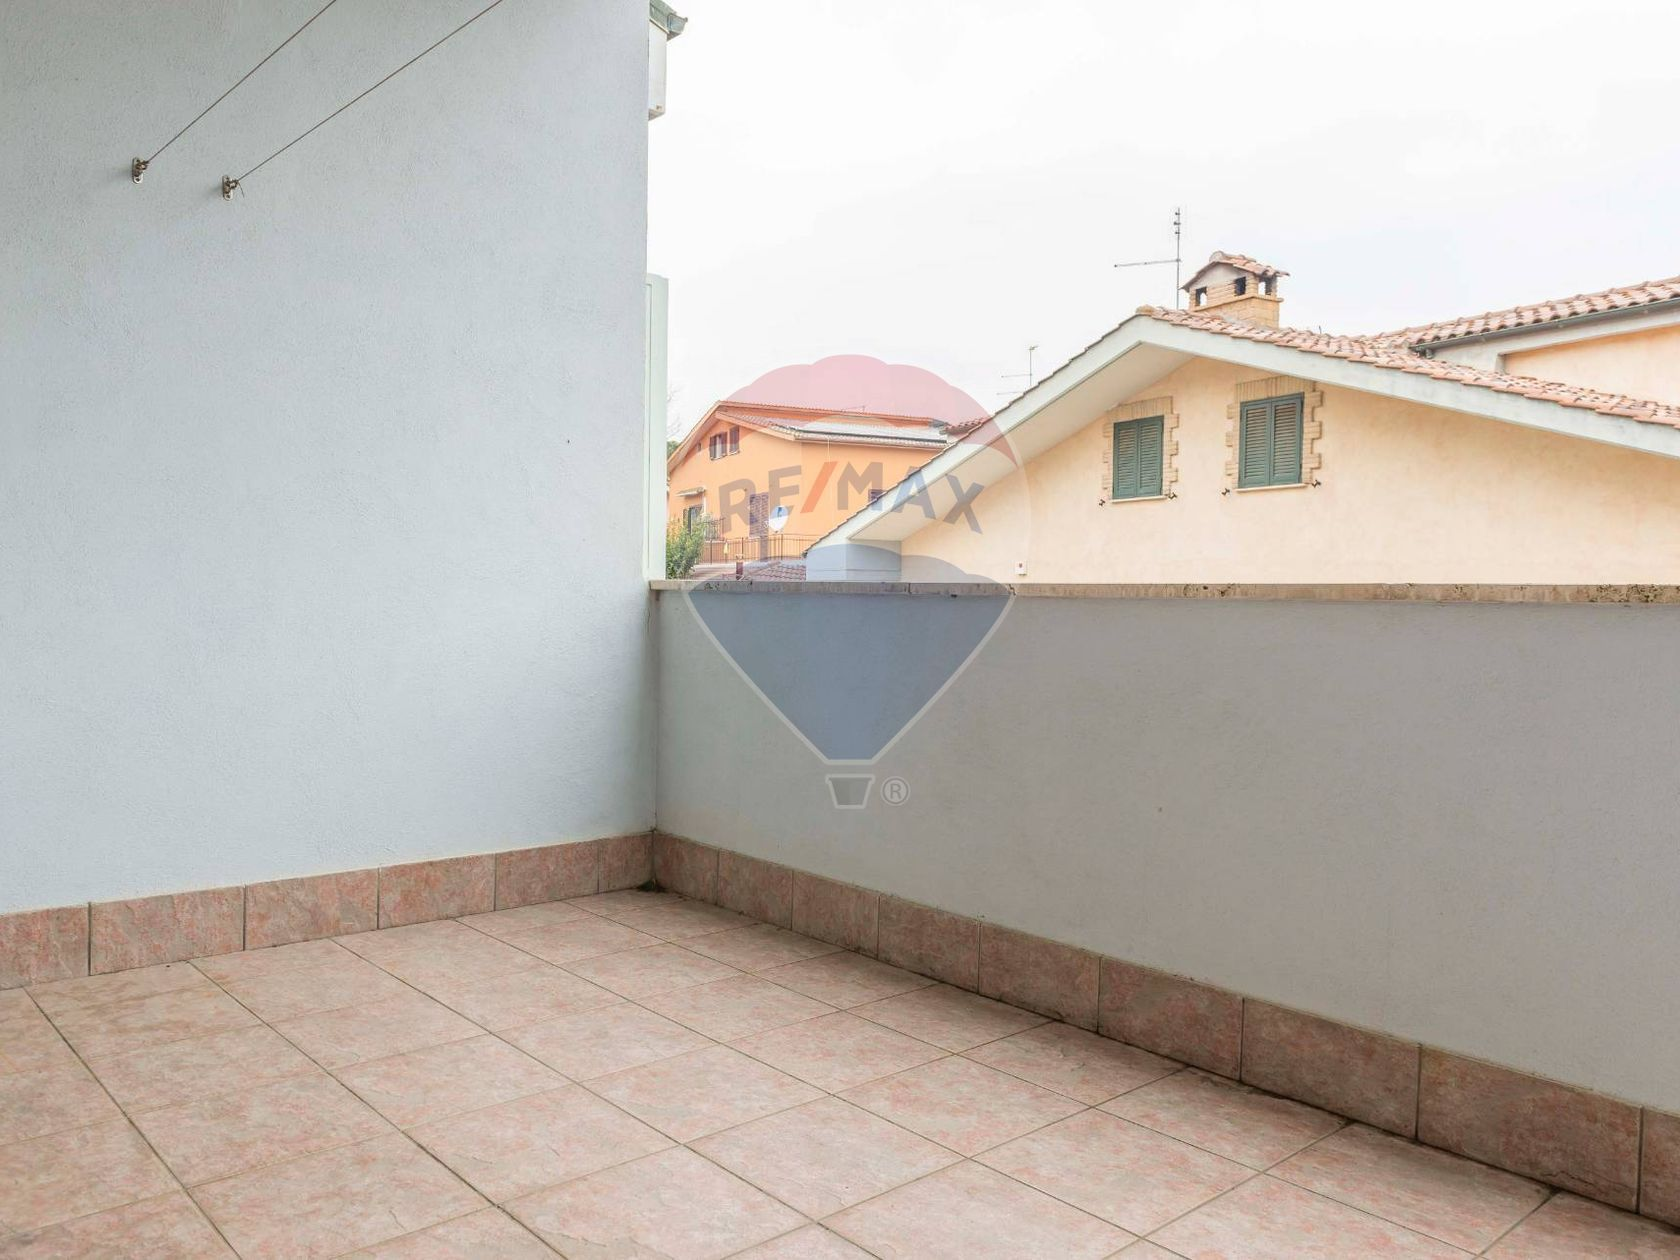 Villa o villino Marco Simone, Guidonia Montecelio, RM Vendita - Foto 28